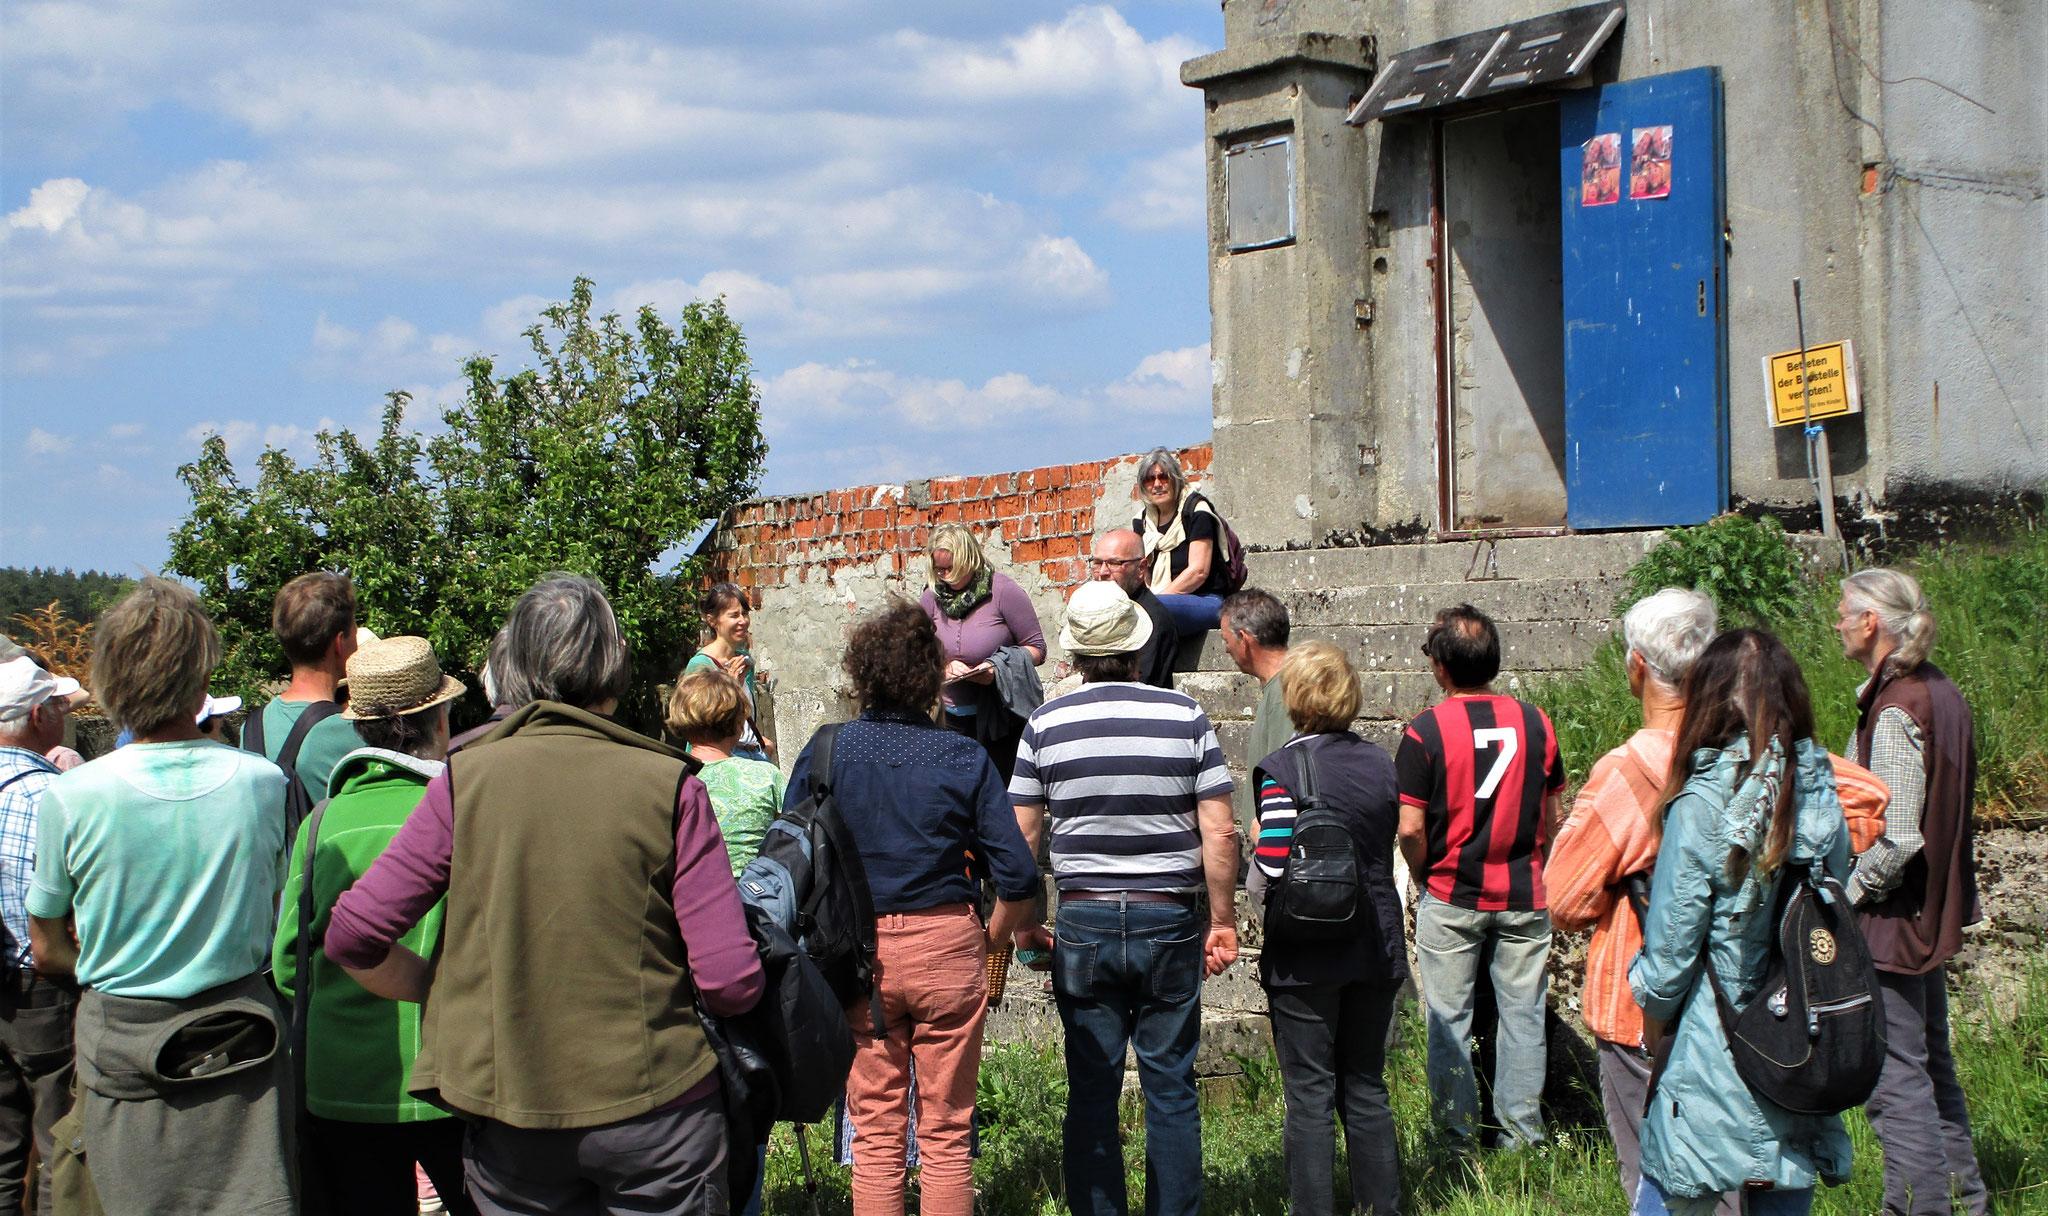 Infos am alten DDR-Wachturm (Foto Ralf Minderlein)